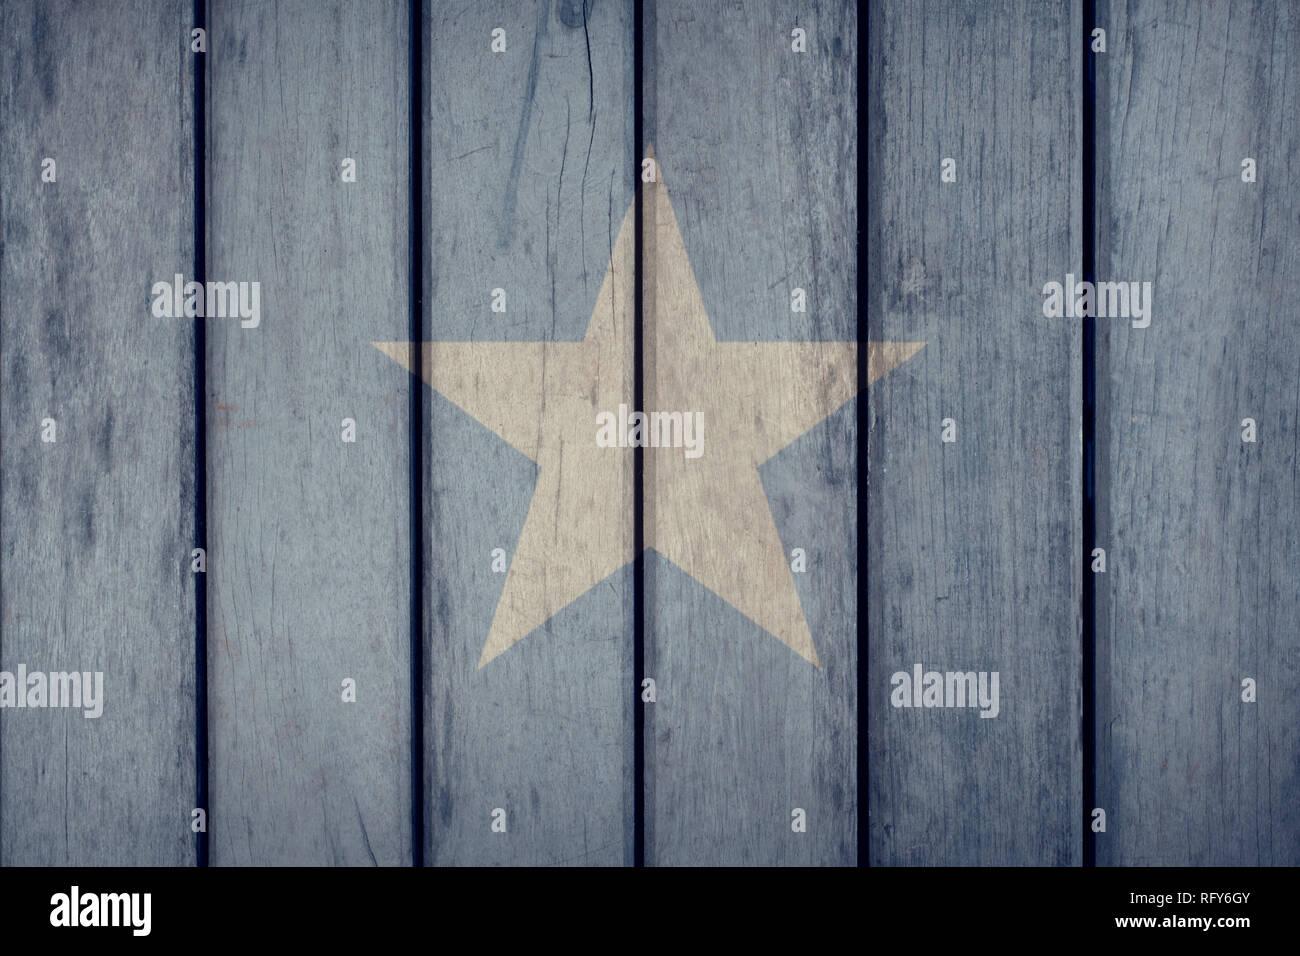 Somalia Politics News Concept: Somalian Flag Wooden Fence - Stock Image